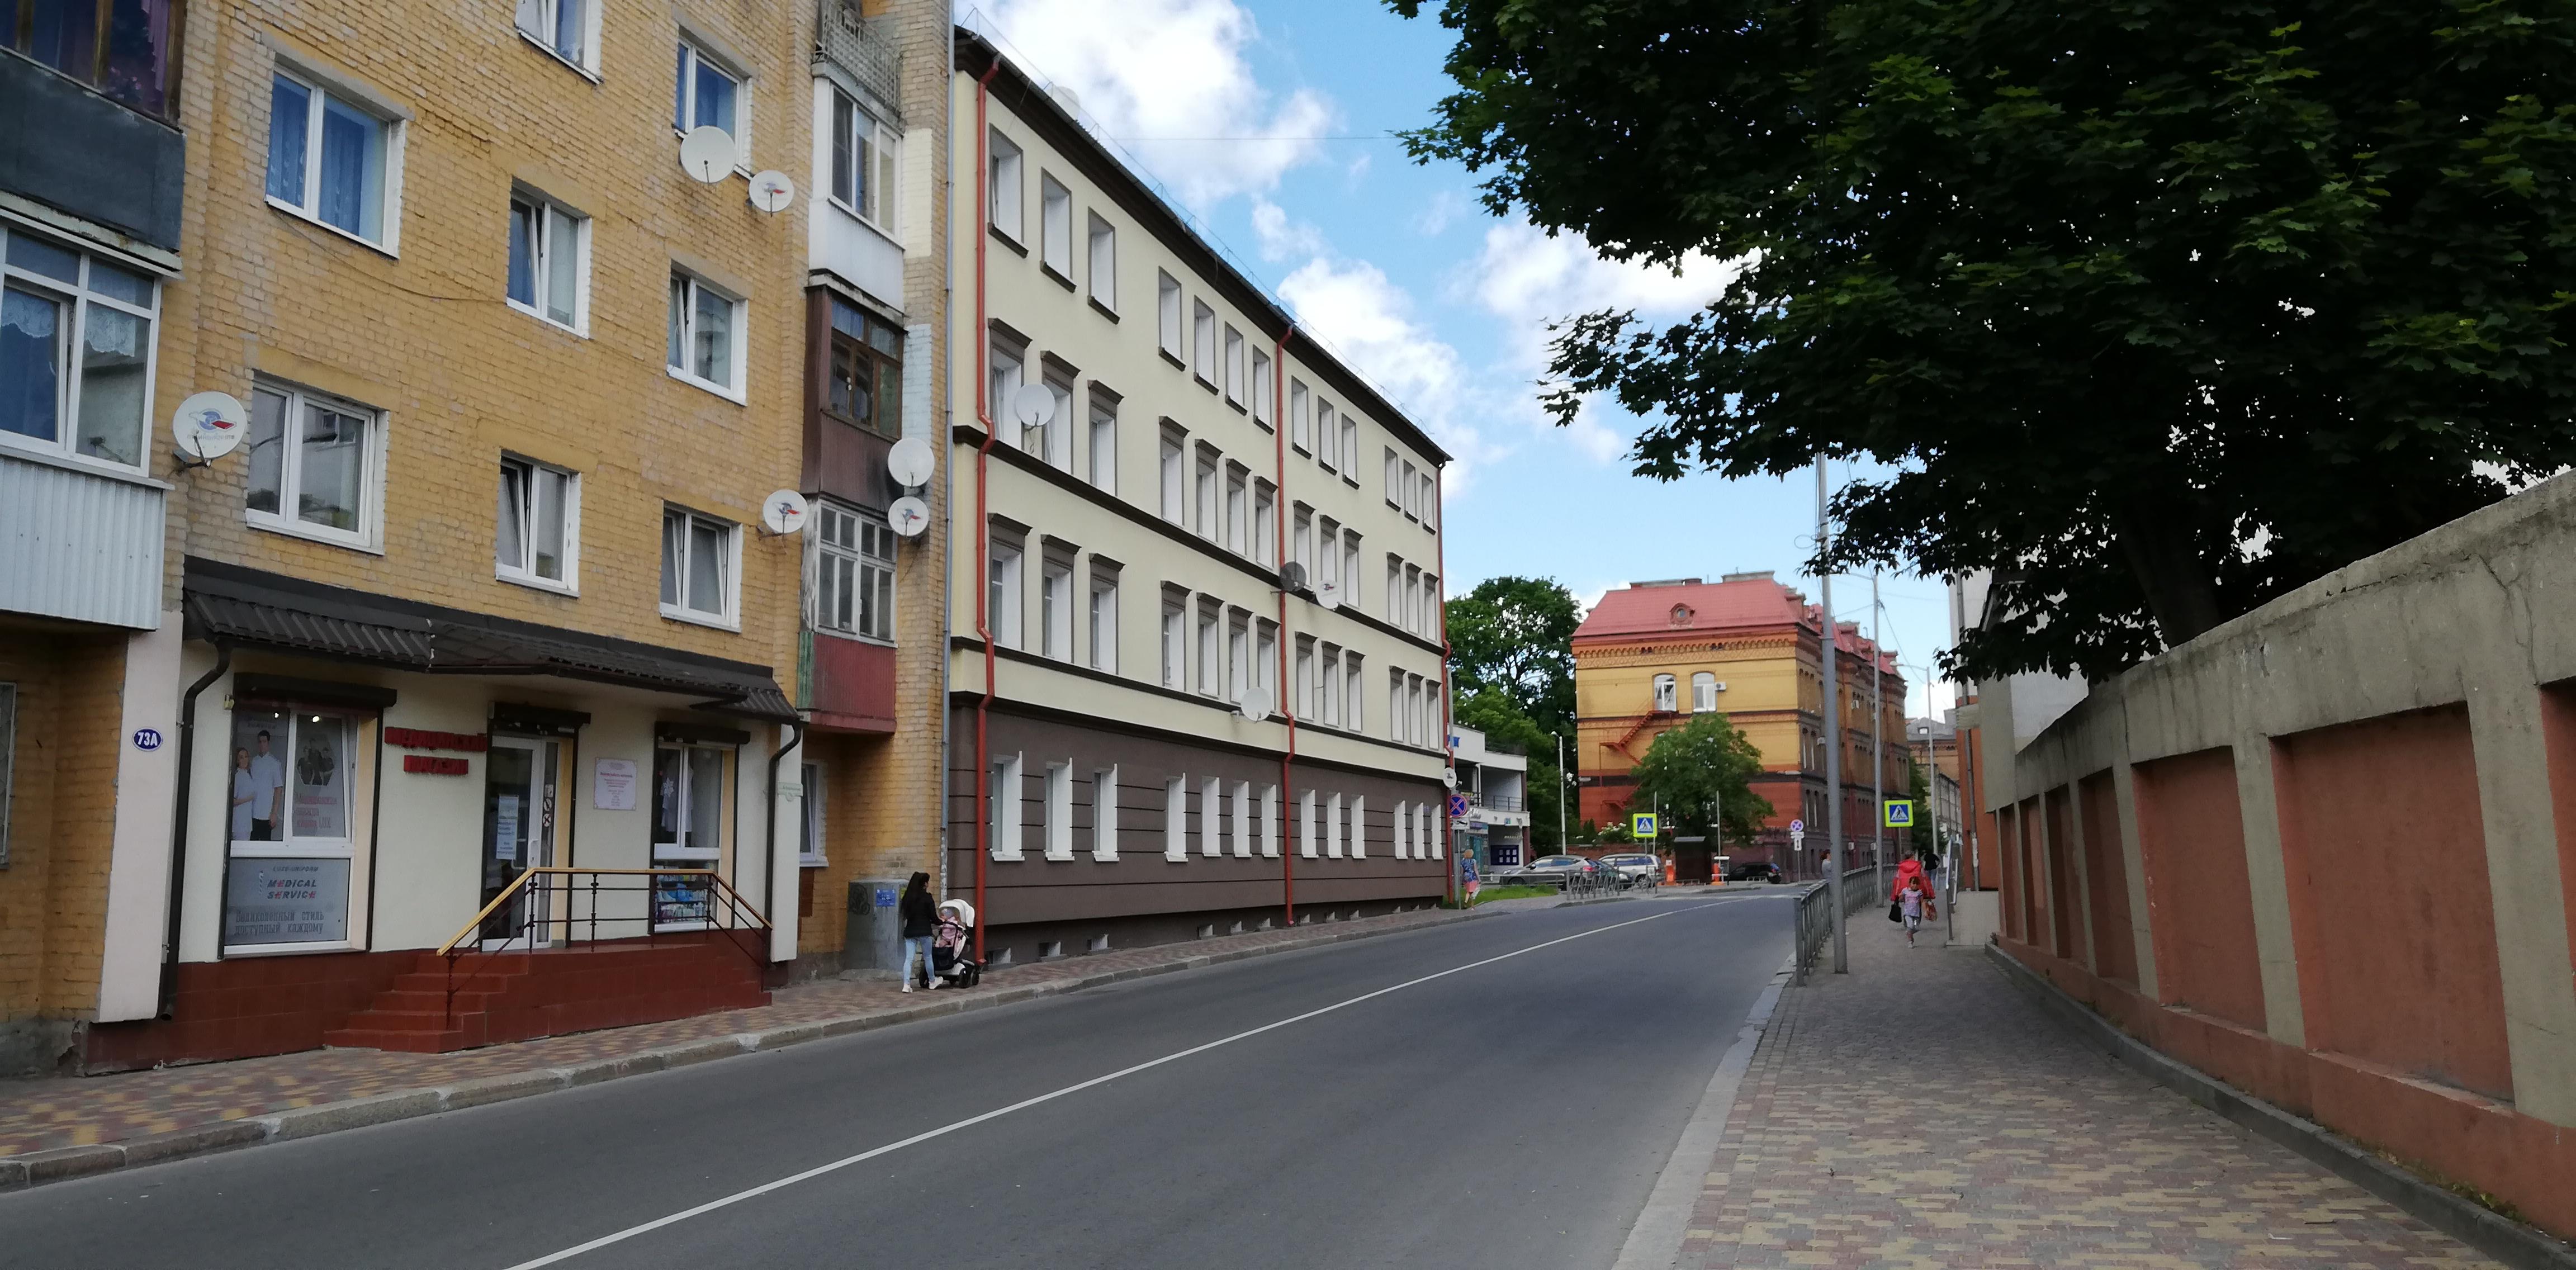 Russian Towns, Cities / Urban Development - Page 6 Img_20210613_163355-jpg